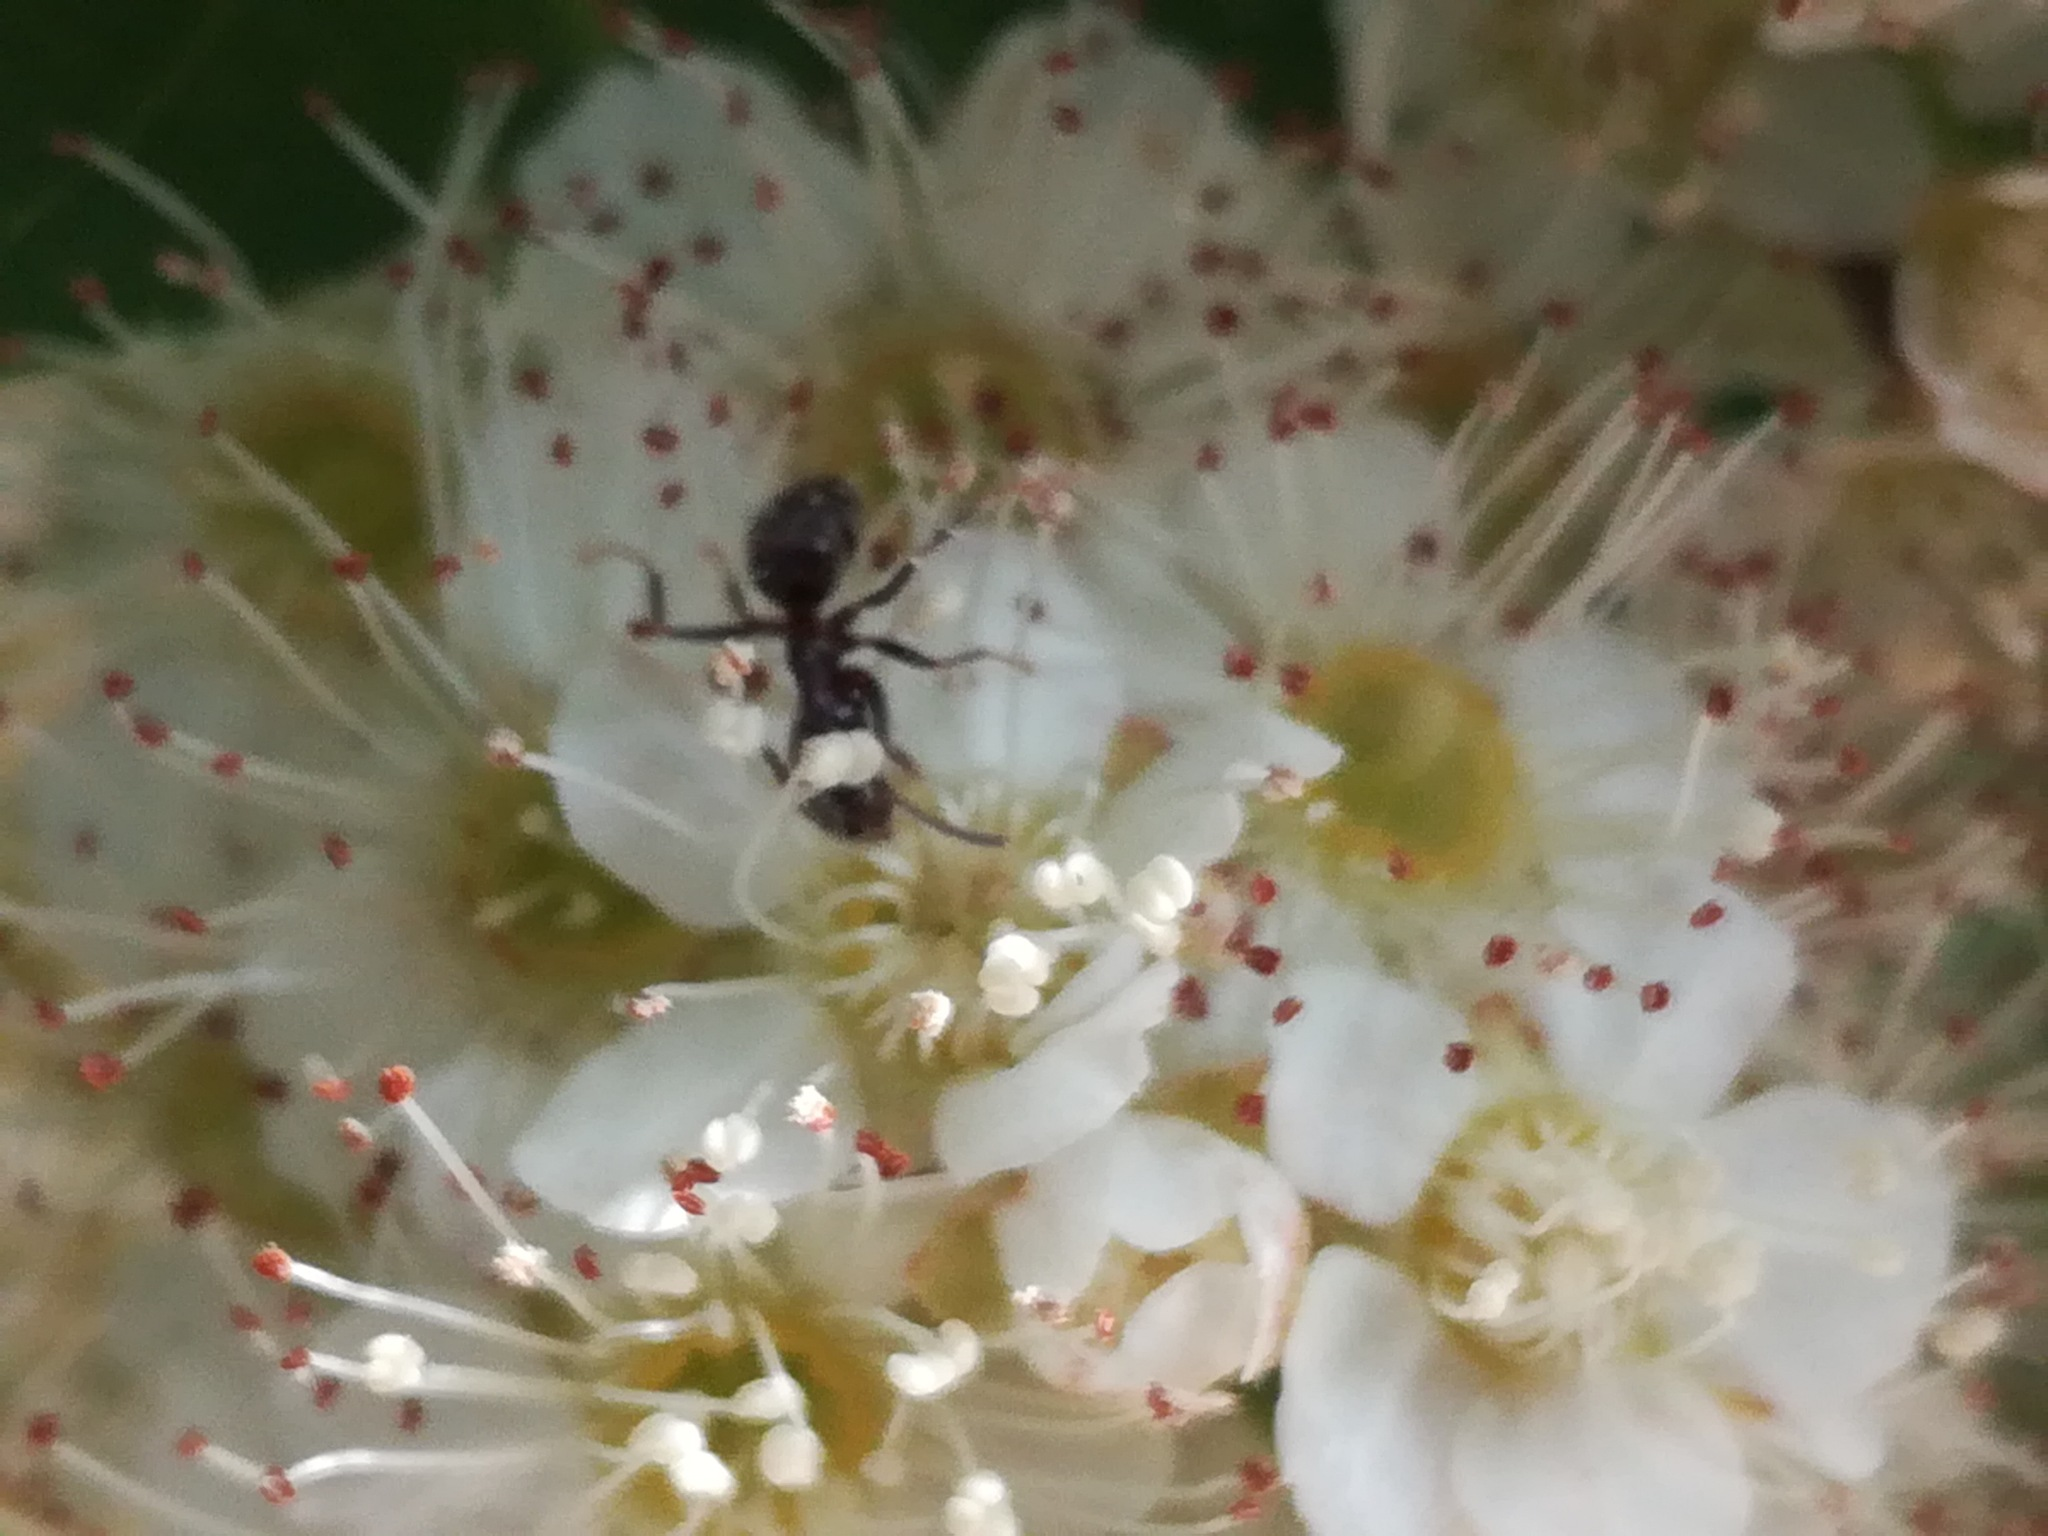 Flower with ants by uzkuraitiene62